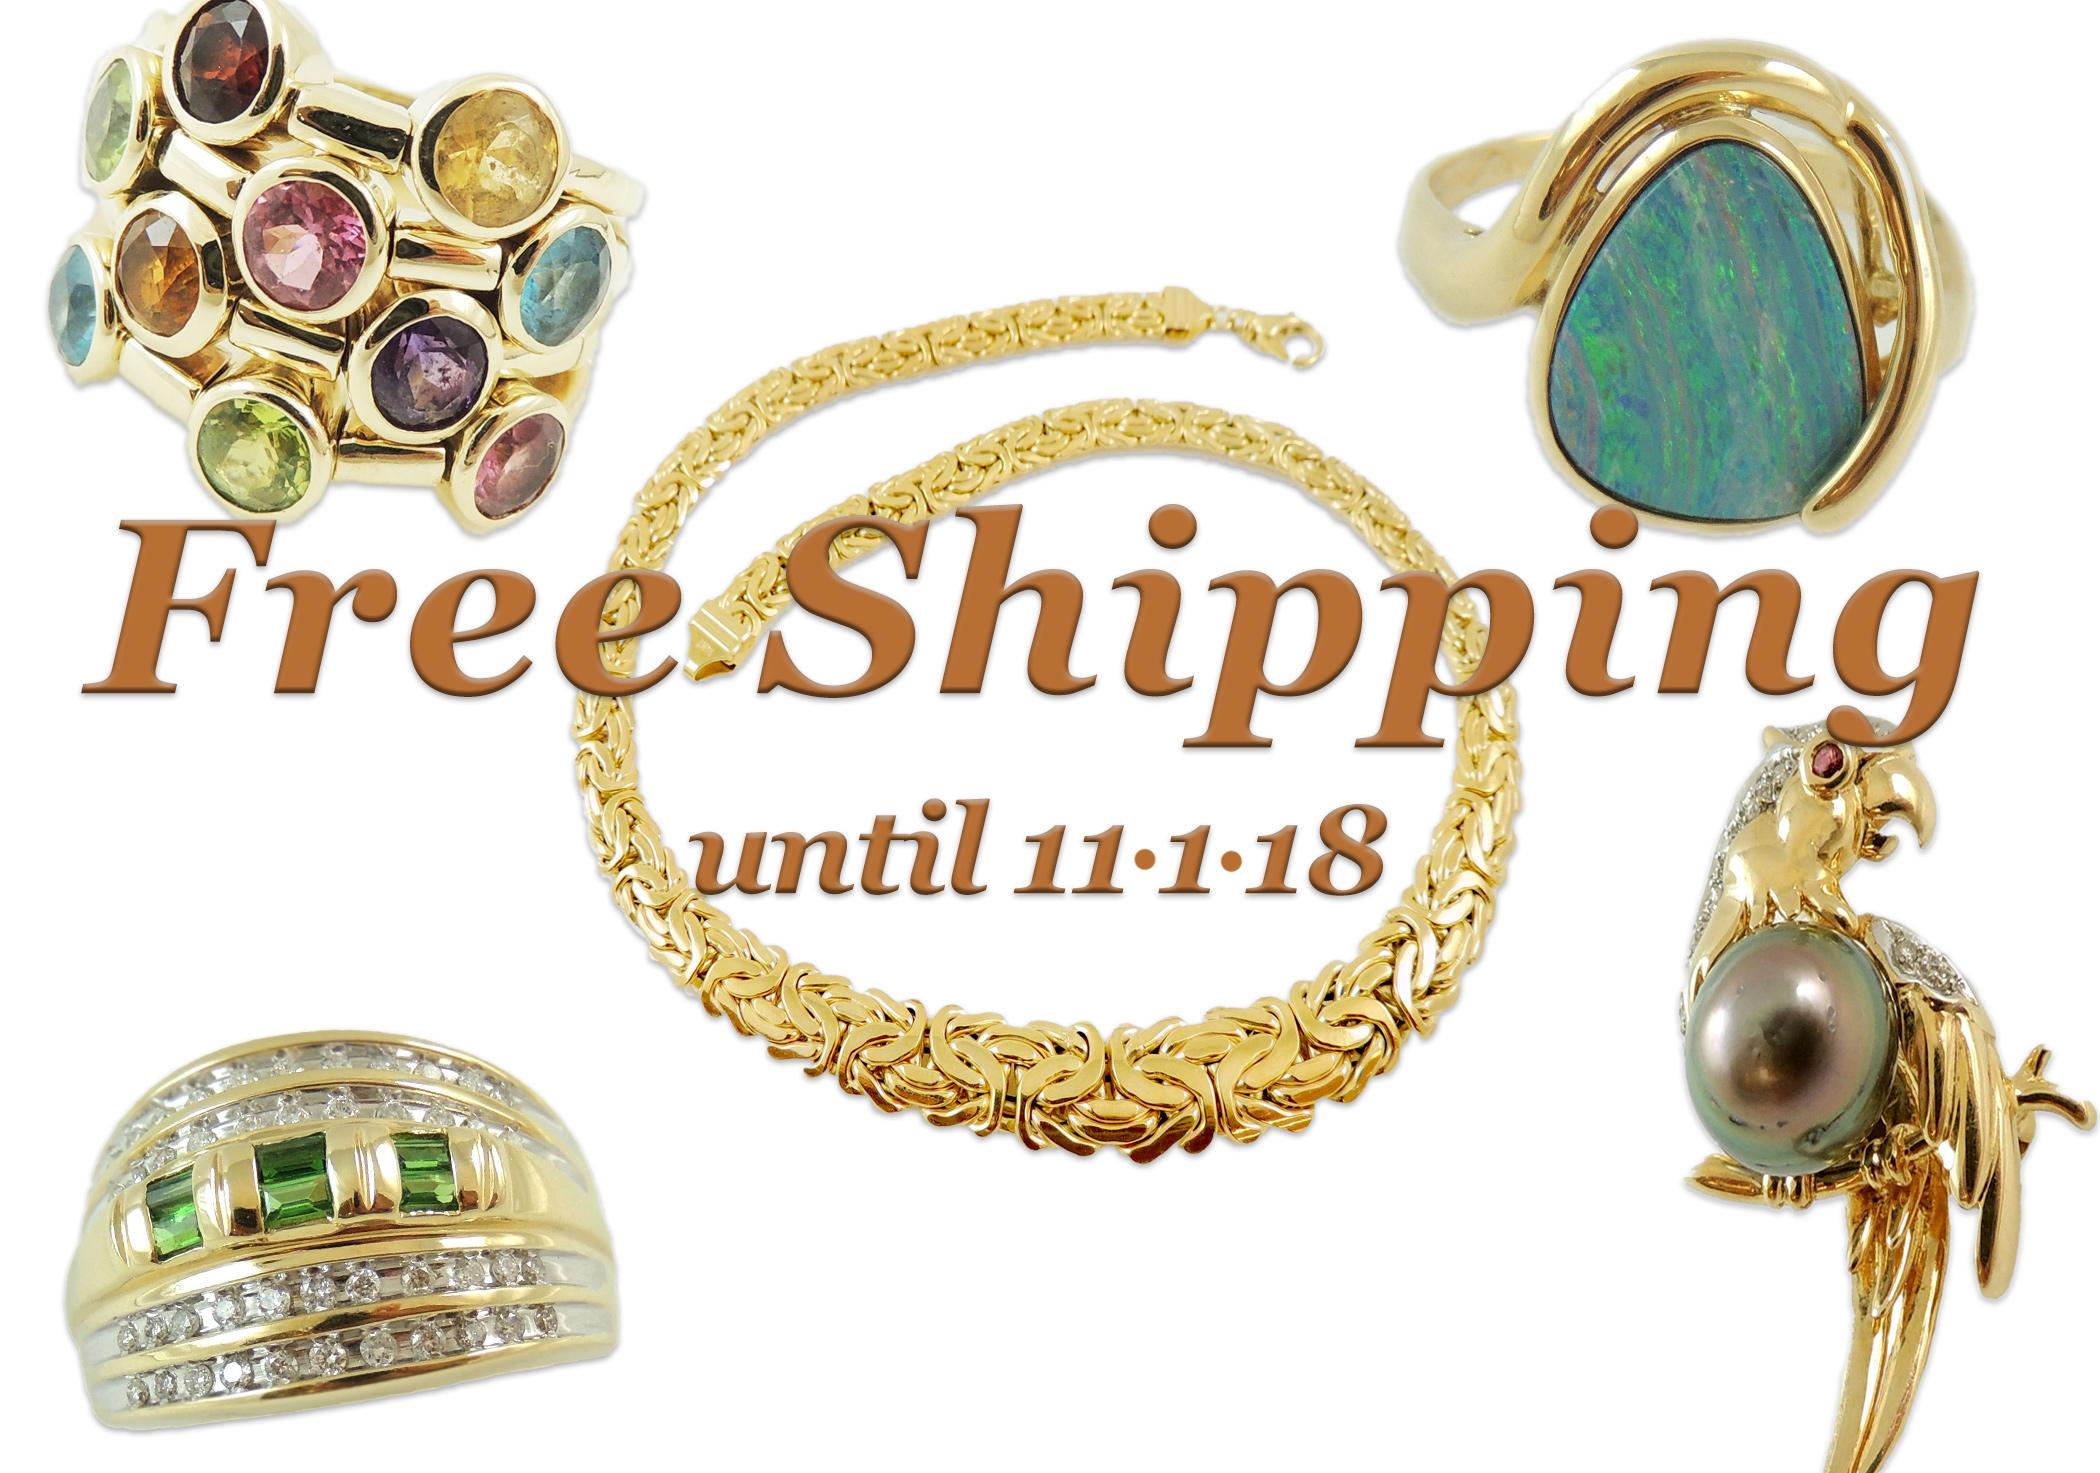 Neecejewelers.etsy.com